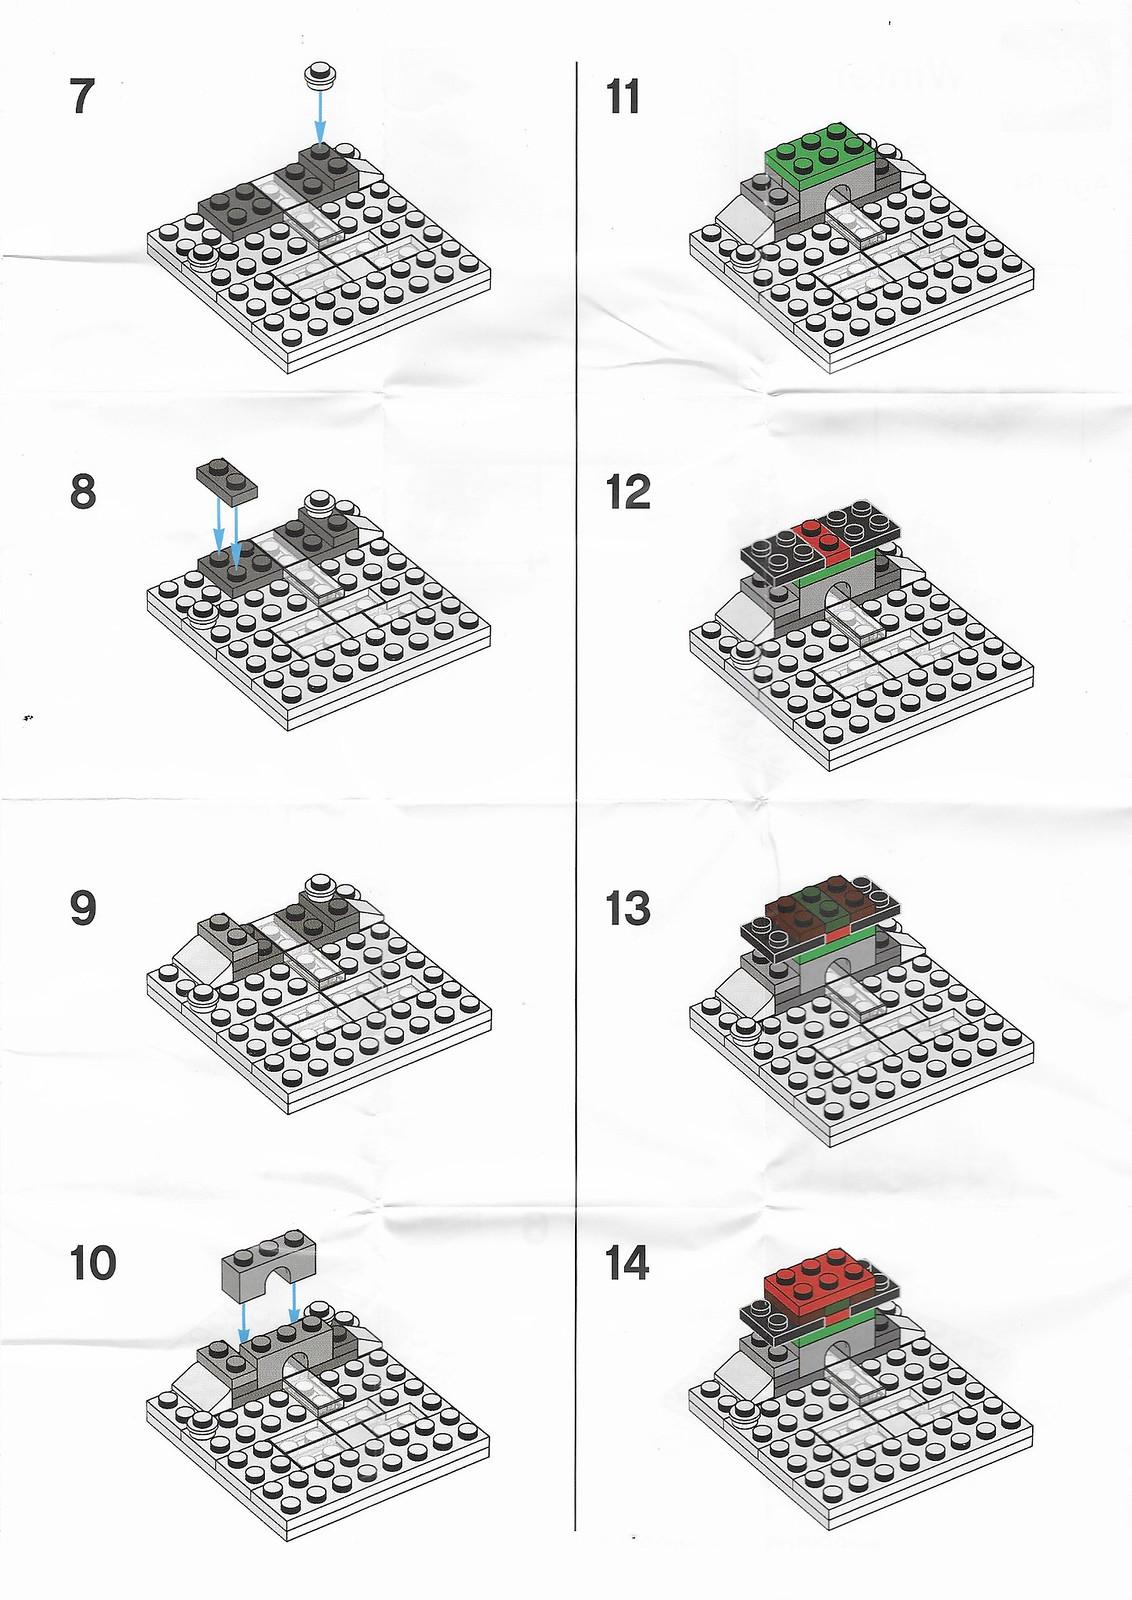 Toys 'R' Us LEGO Bricktober 2019 - Winter